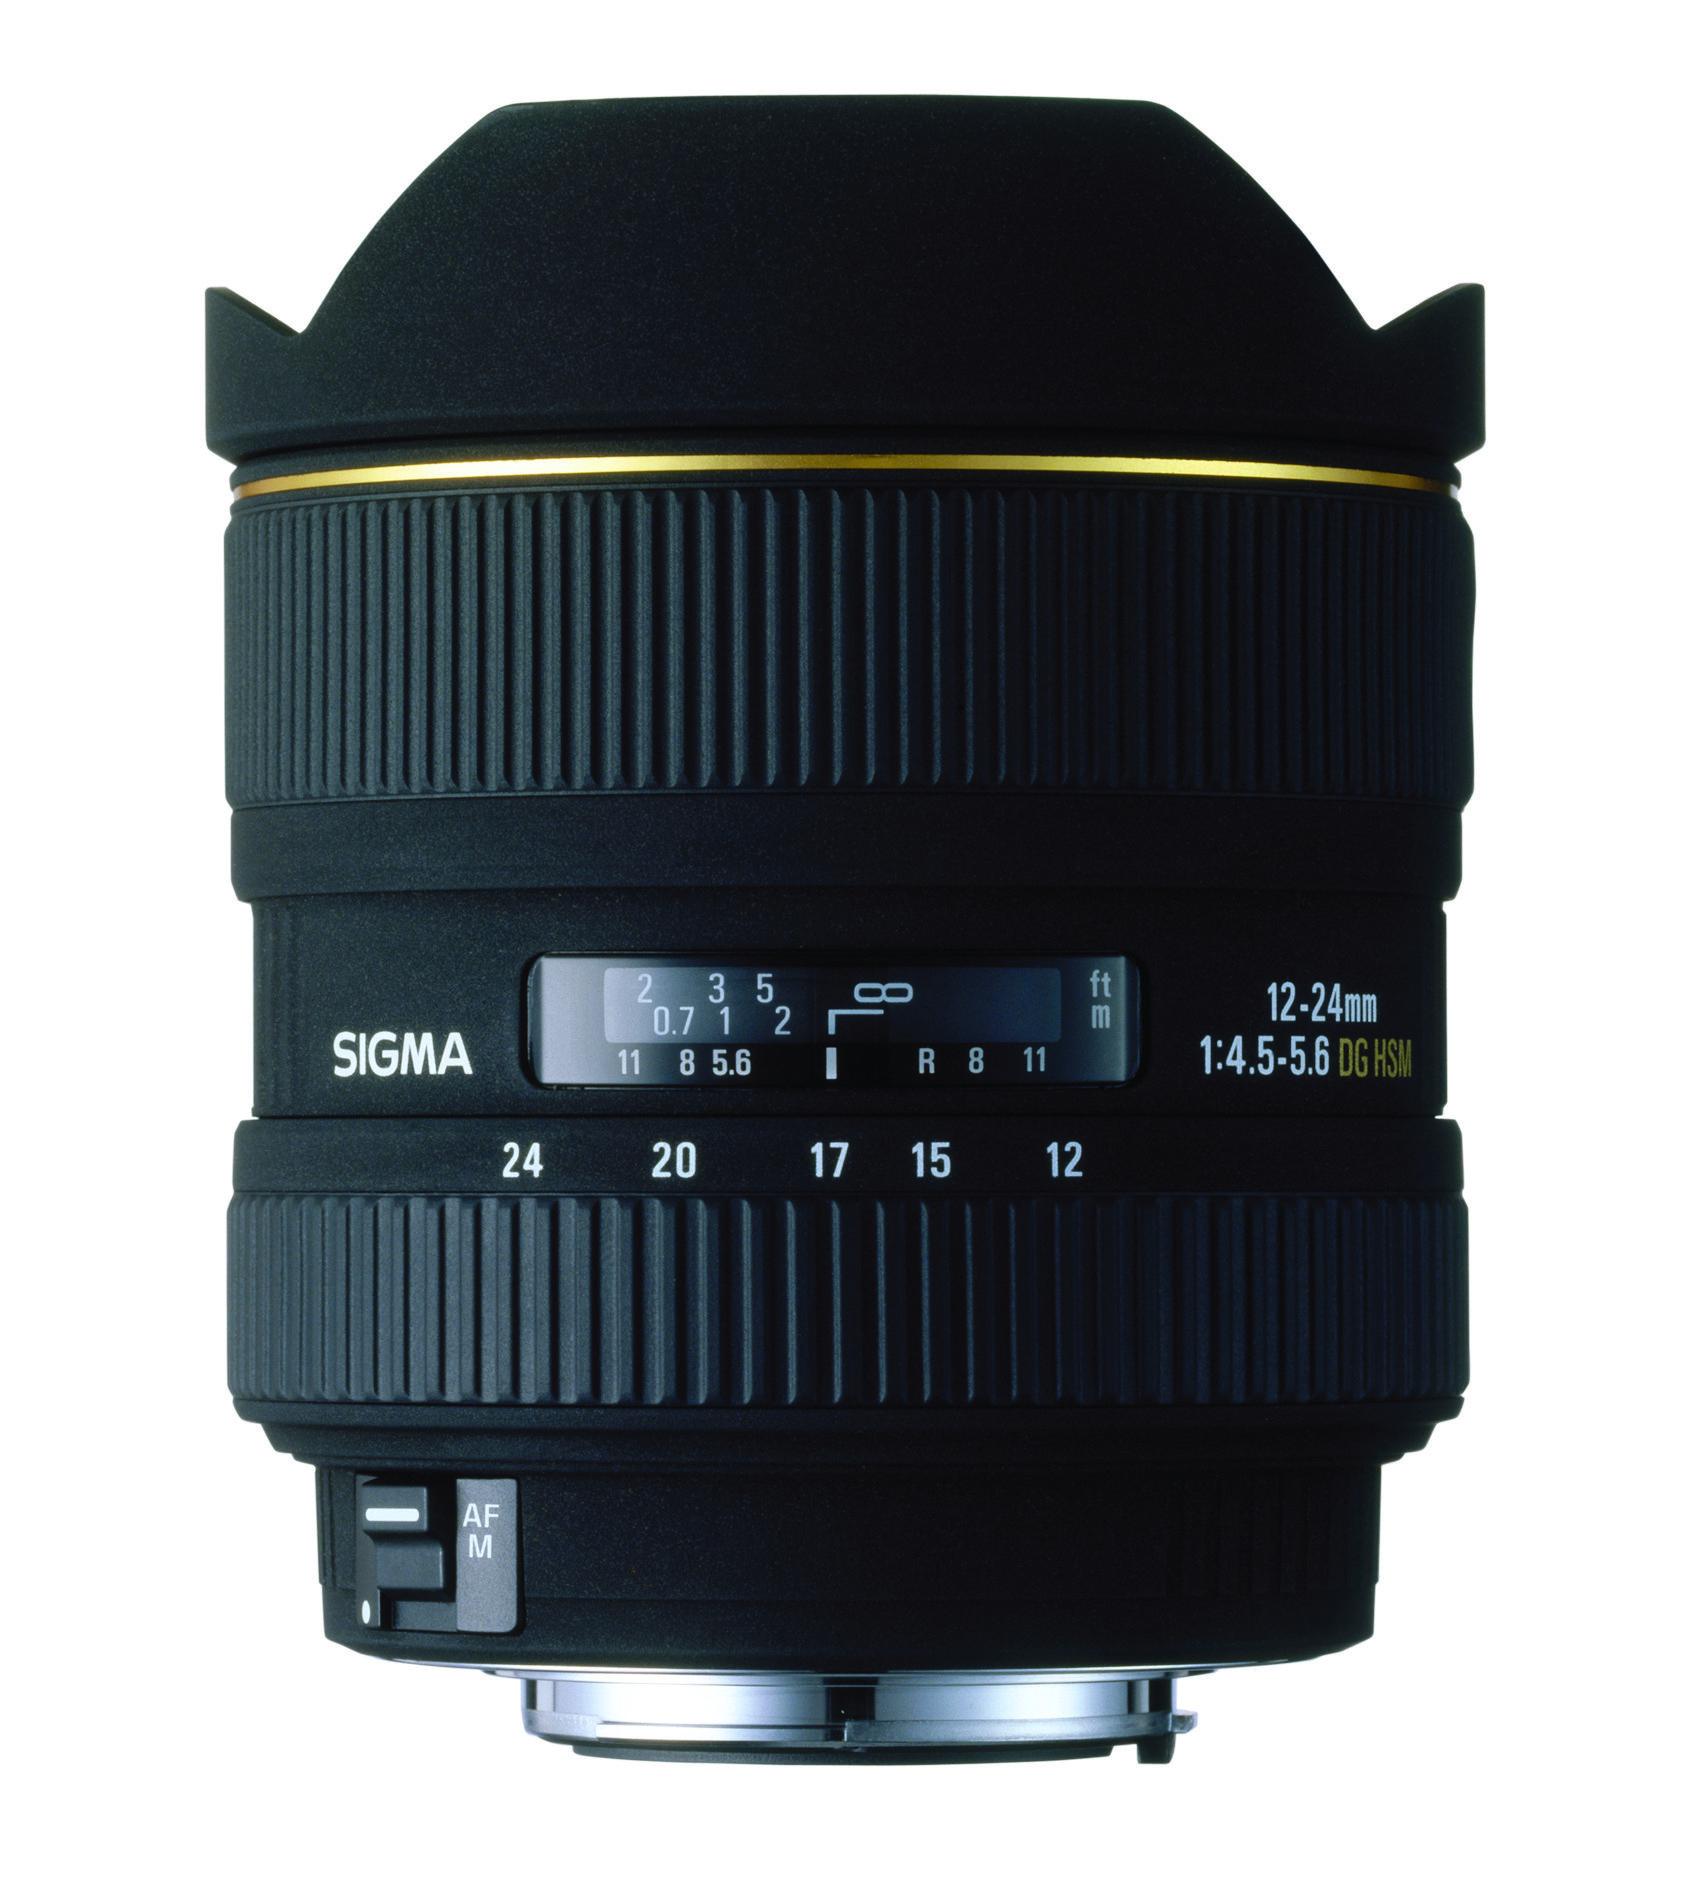 12 24mm F4 5 5 6 Ex Dg Sigma Lenses Digital Camera Lens Sigma Art Lens